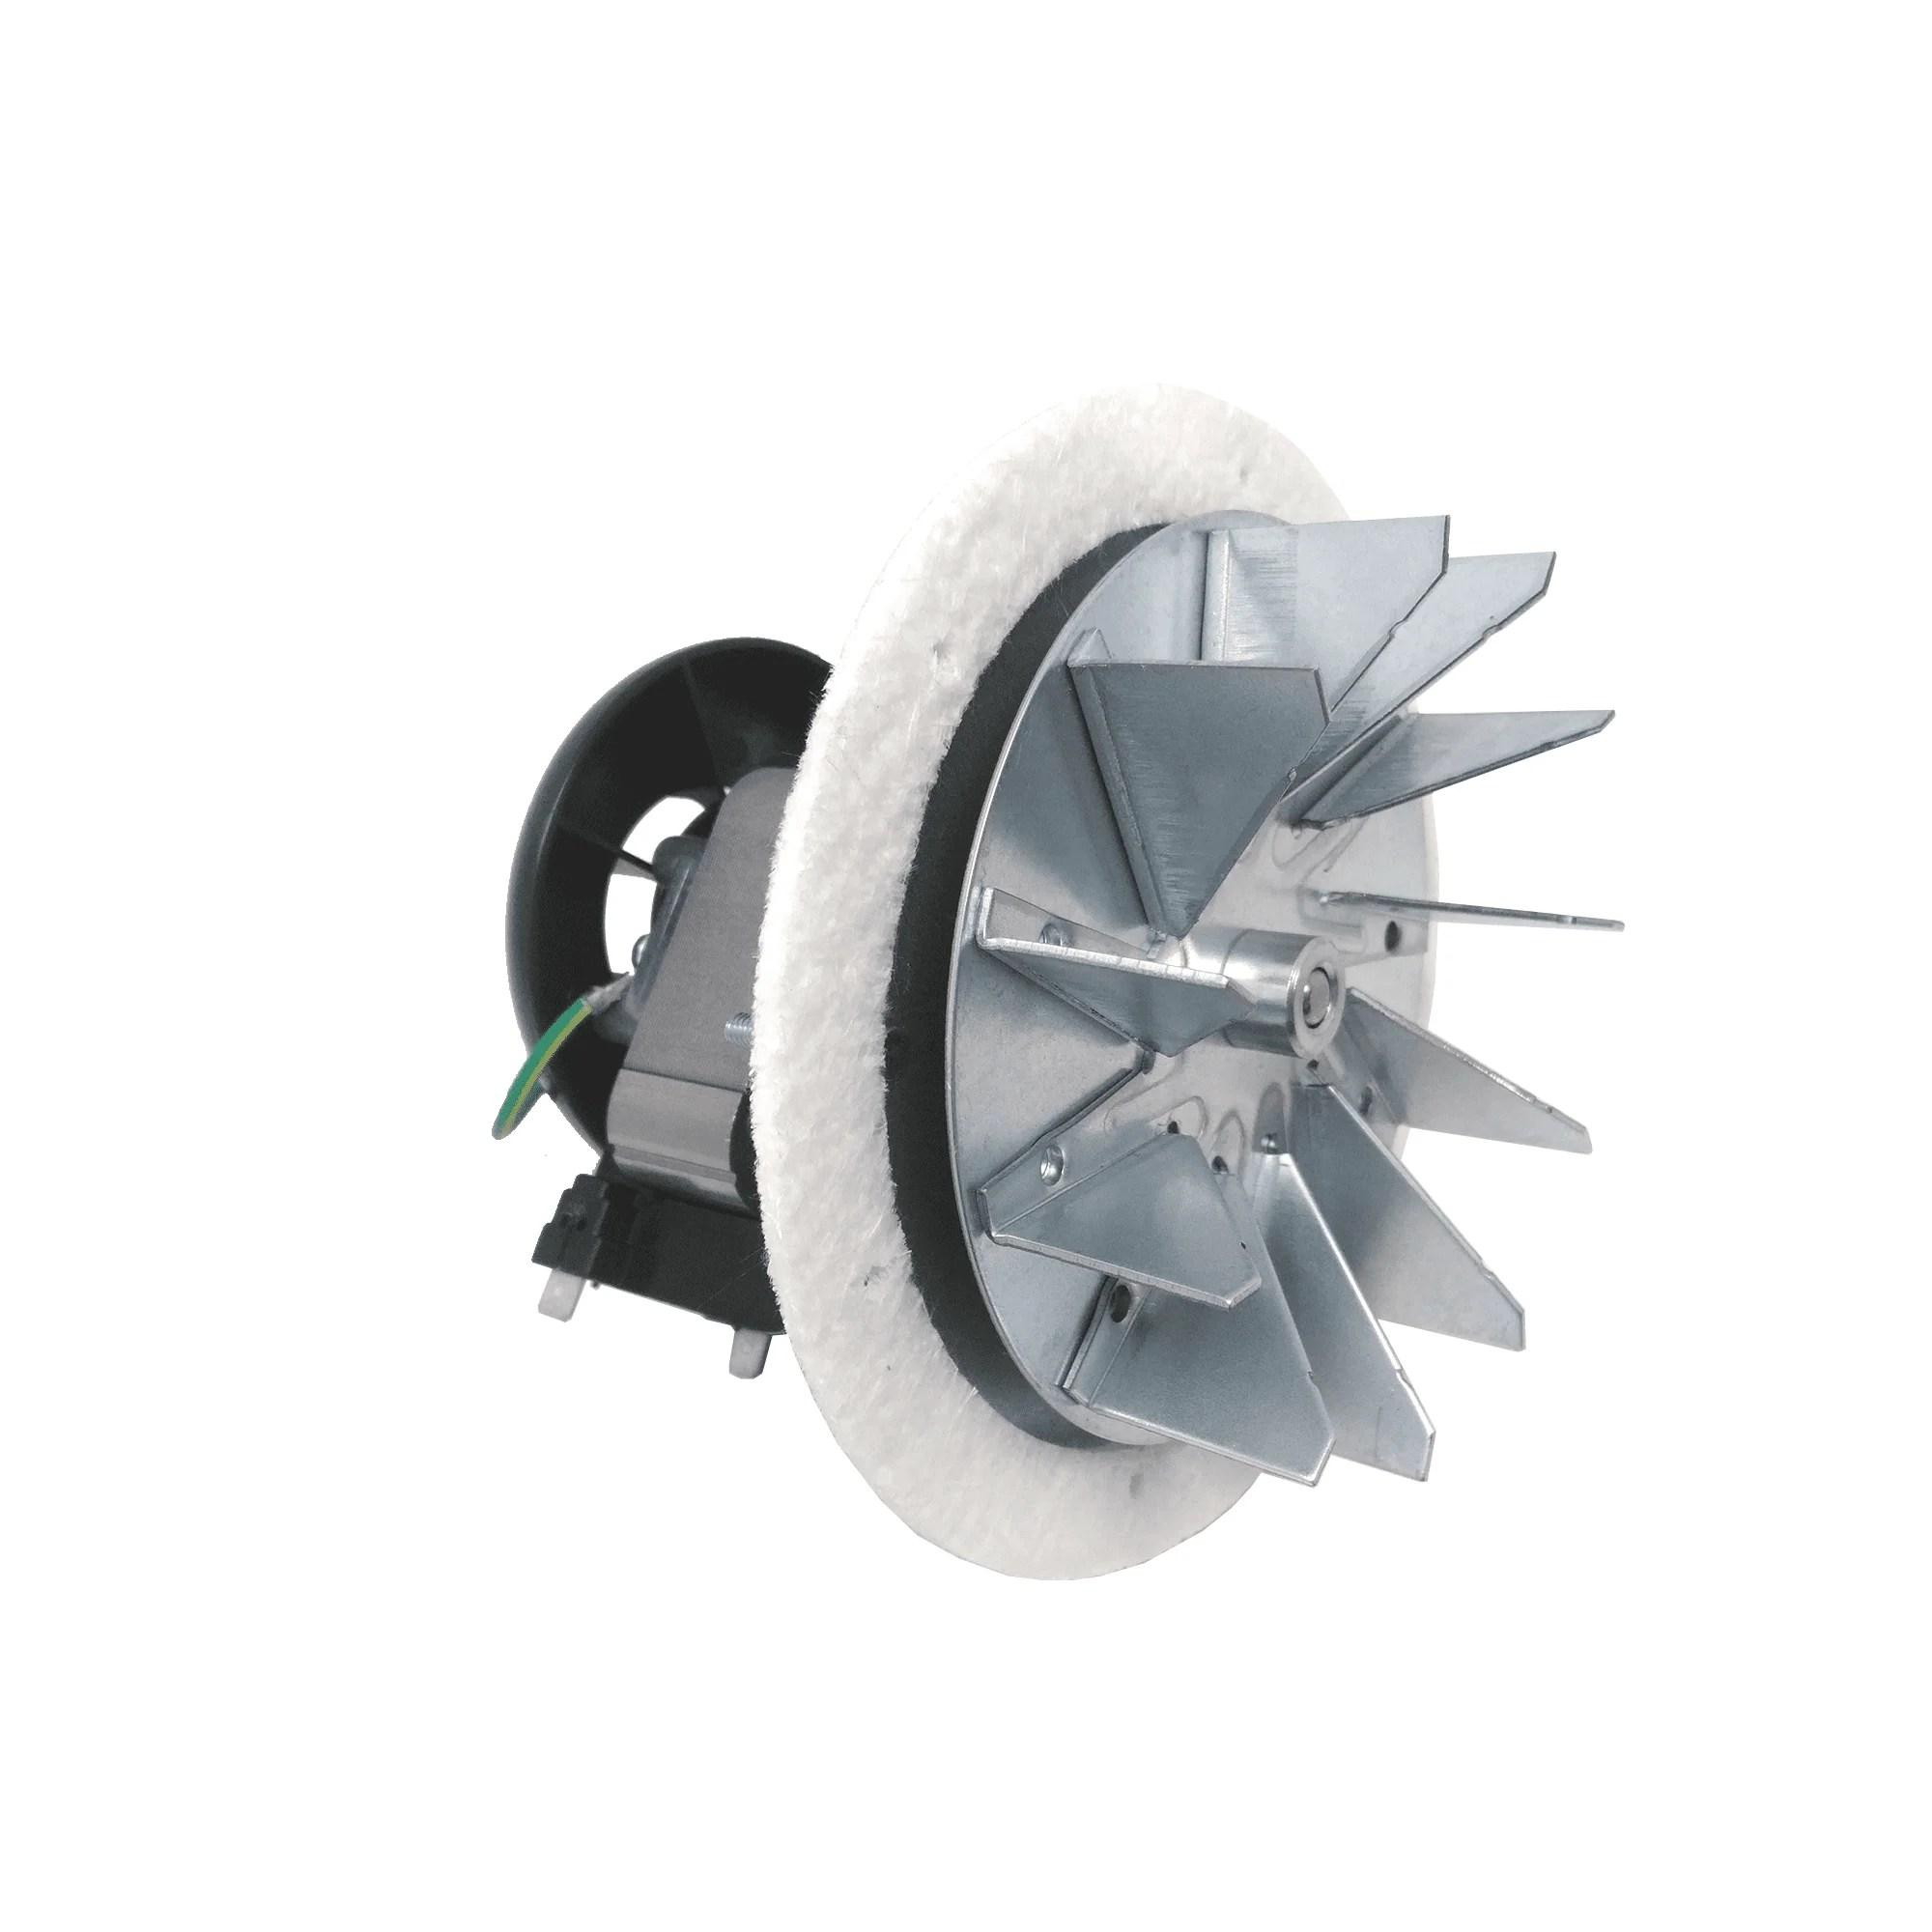 kozi pellet stove exhaust blower by fasco part fan12003 amp